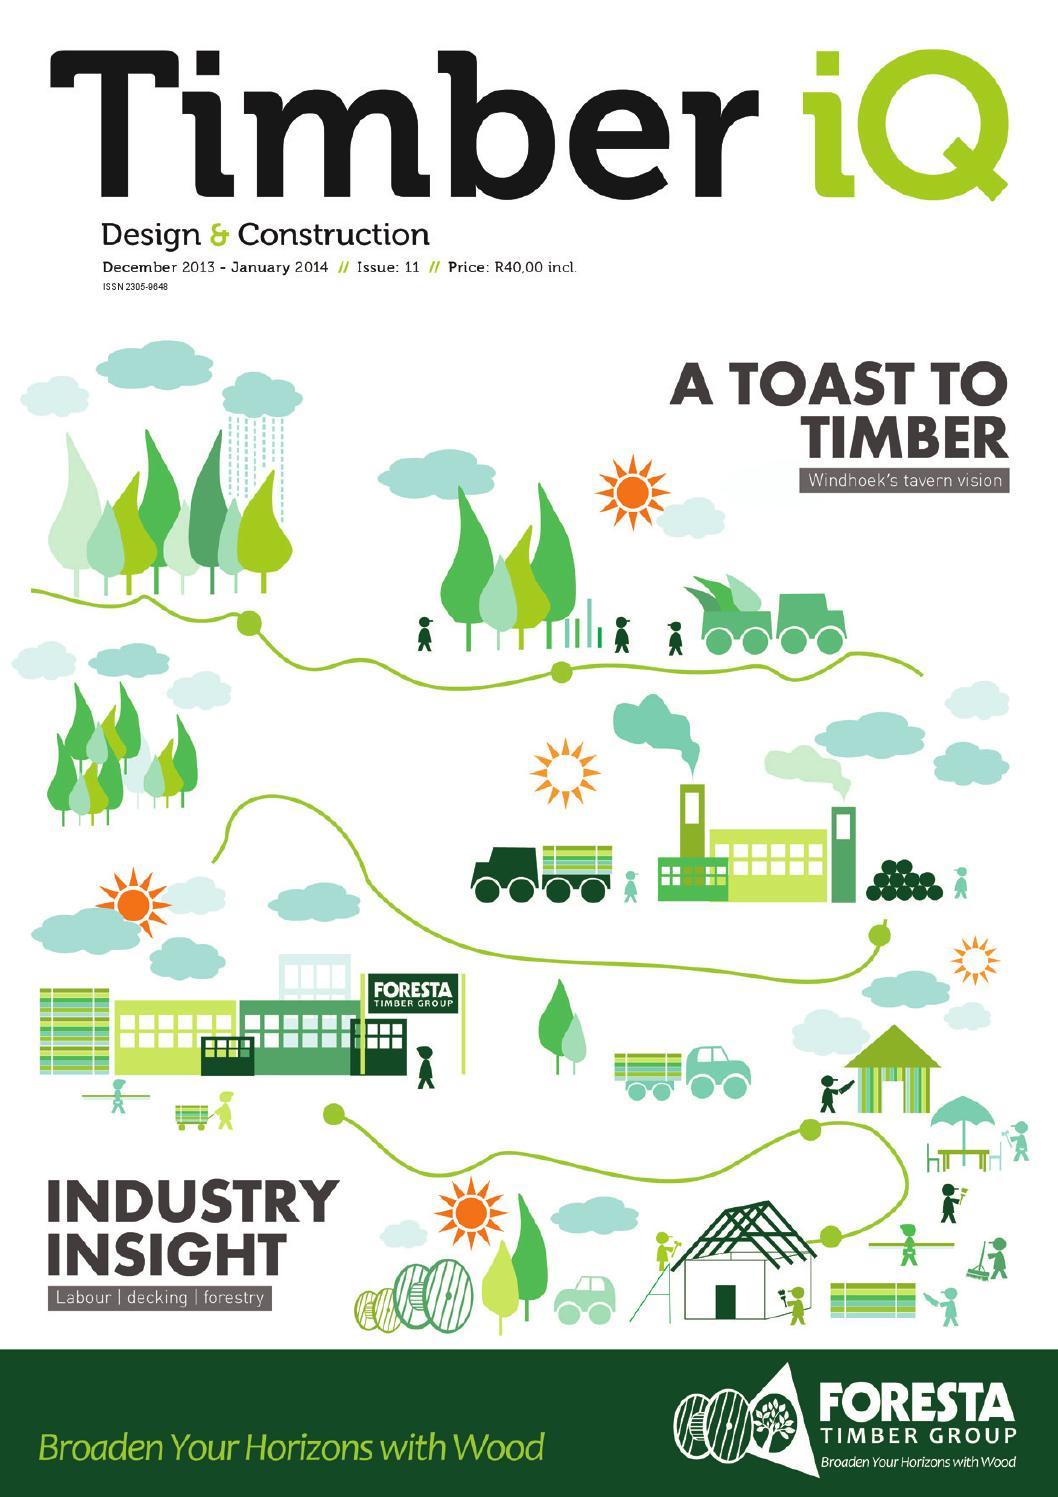 kabatasan timber extraction co Dalam kes kabatasan timber extraction co lwn chong fah shing,[7] a  bersetuju membekalkan kayu balak ke kilang r a telah mengirim.